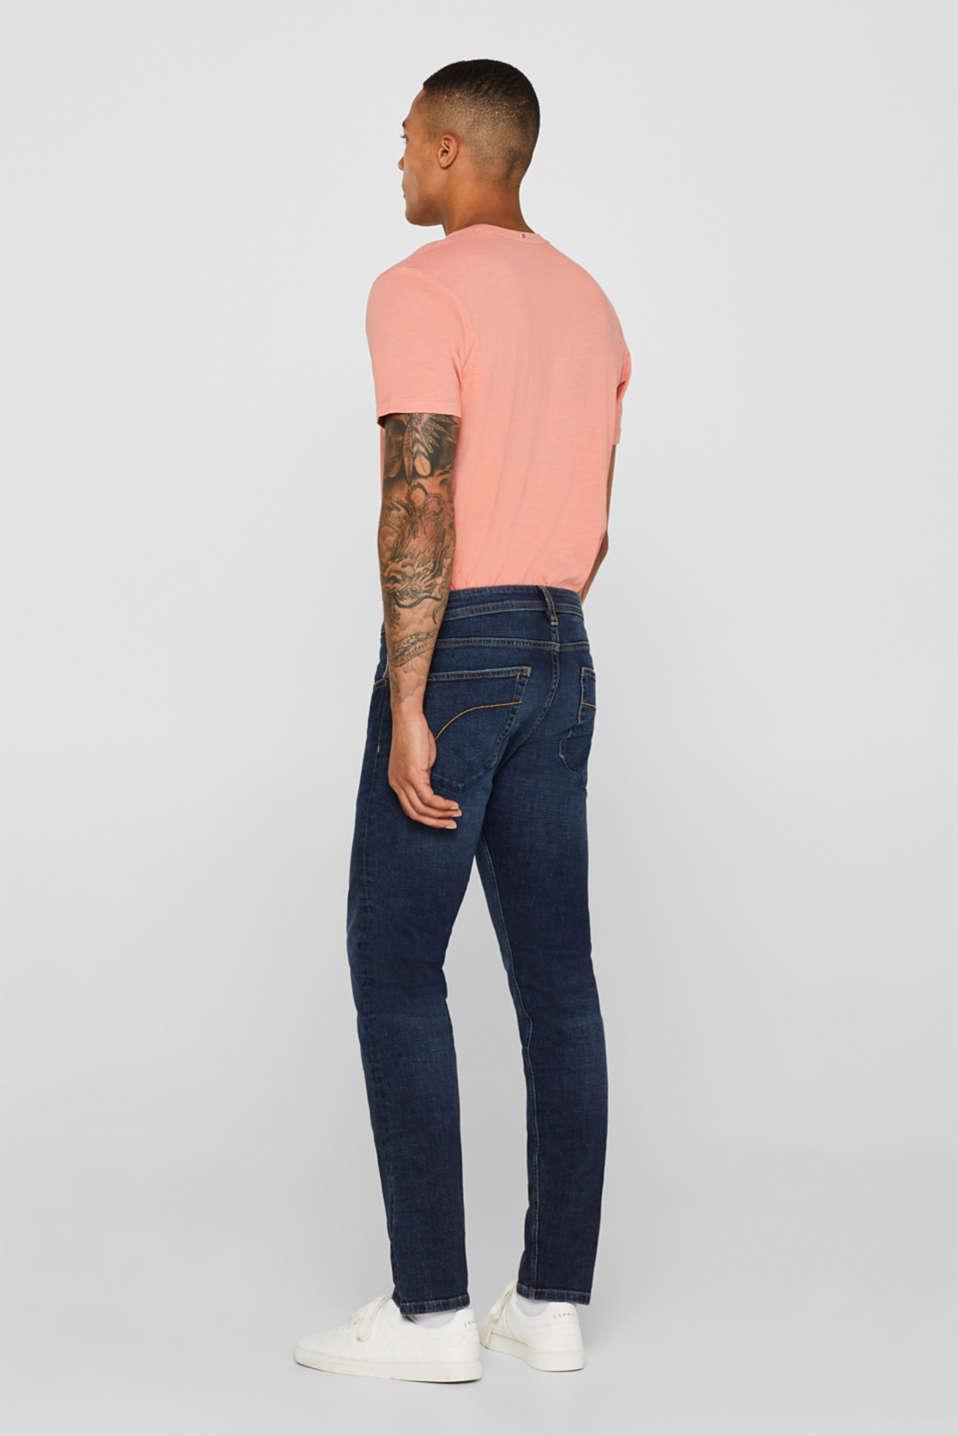 Pants denim Slim fit, BLUE DARK WASH, detail image number 1